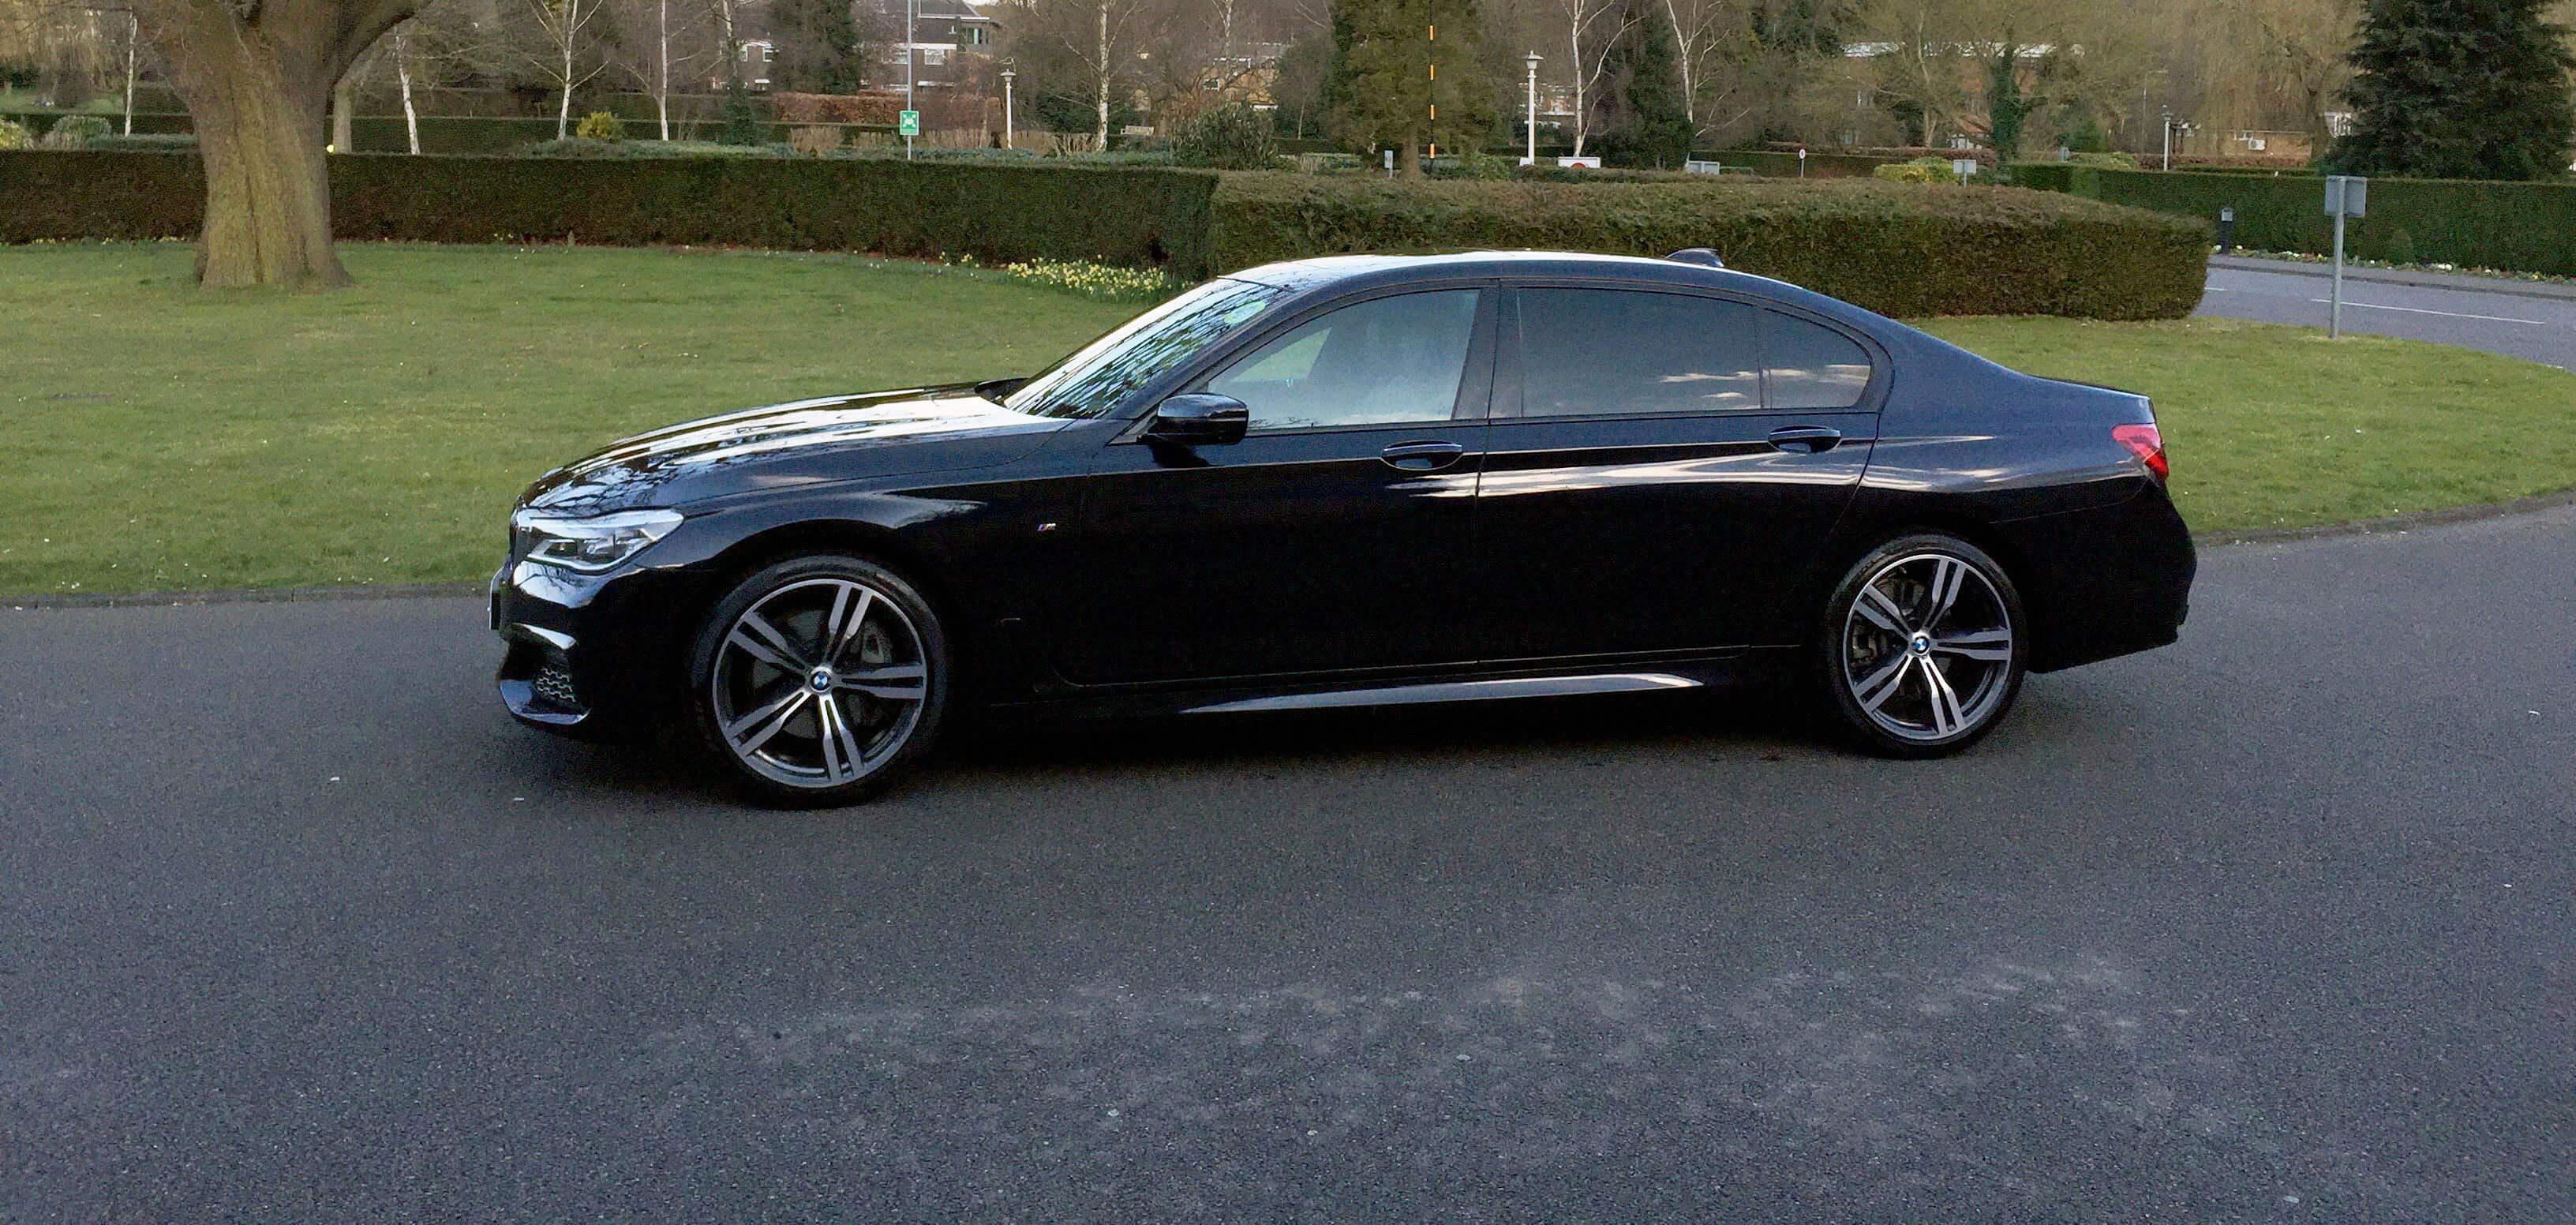 BMW Side View